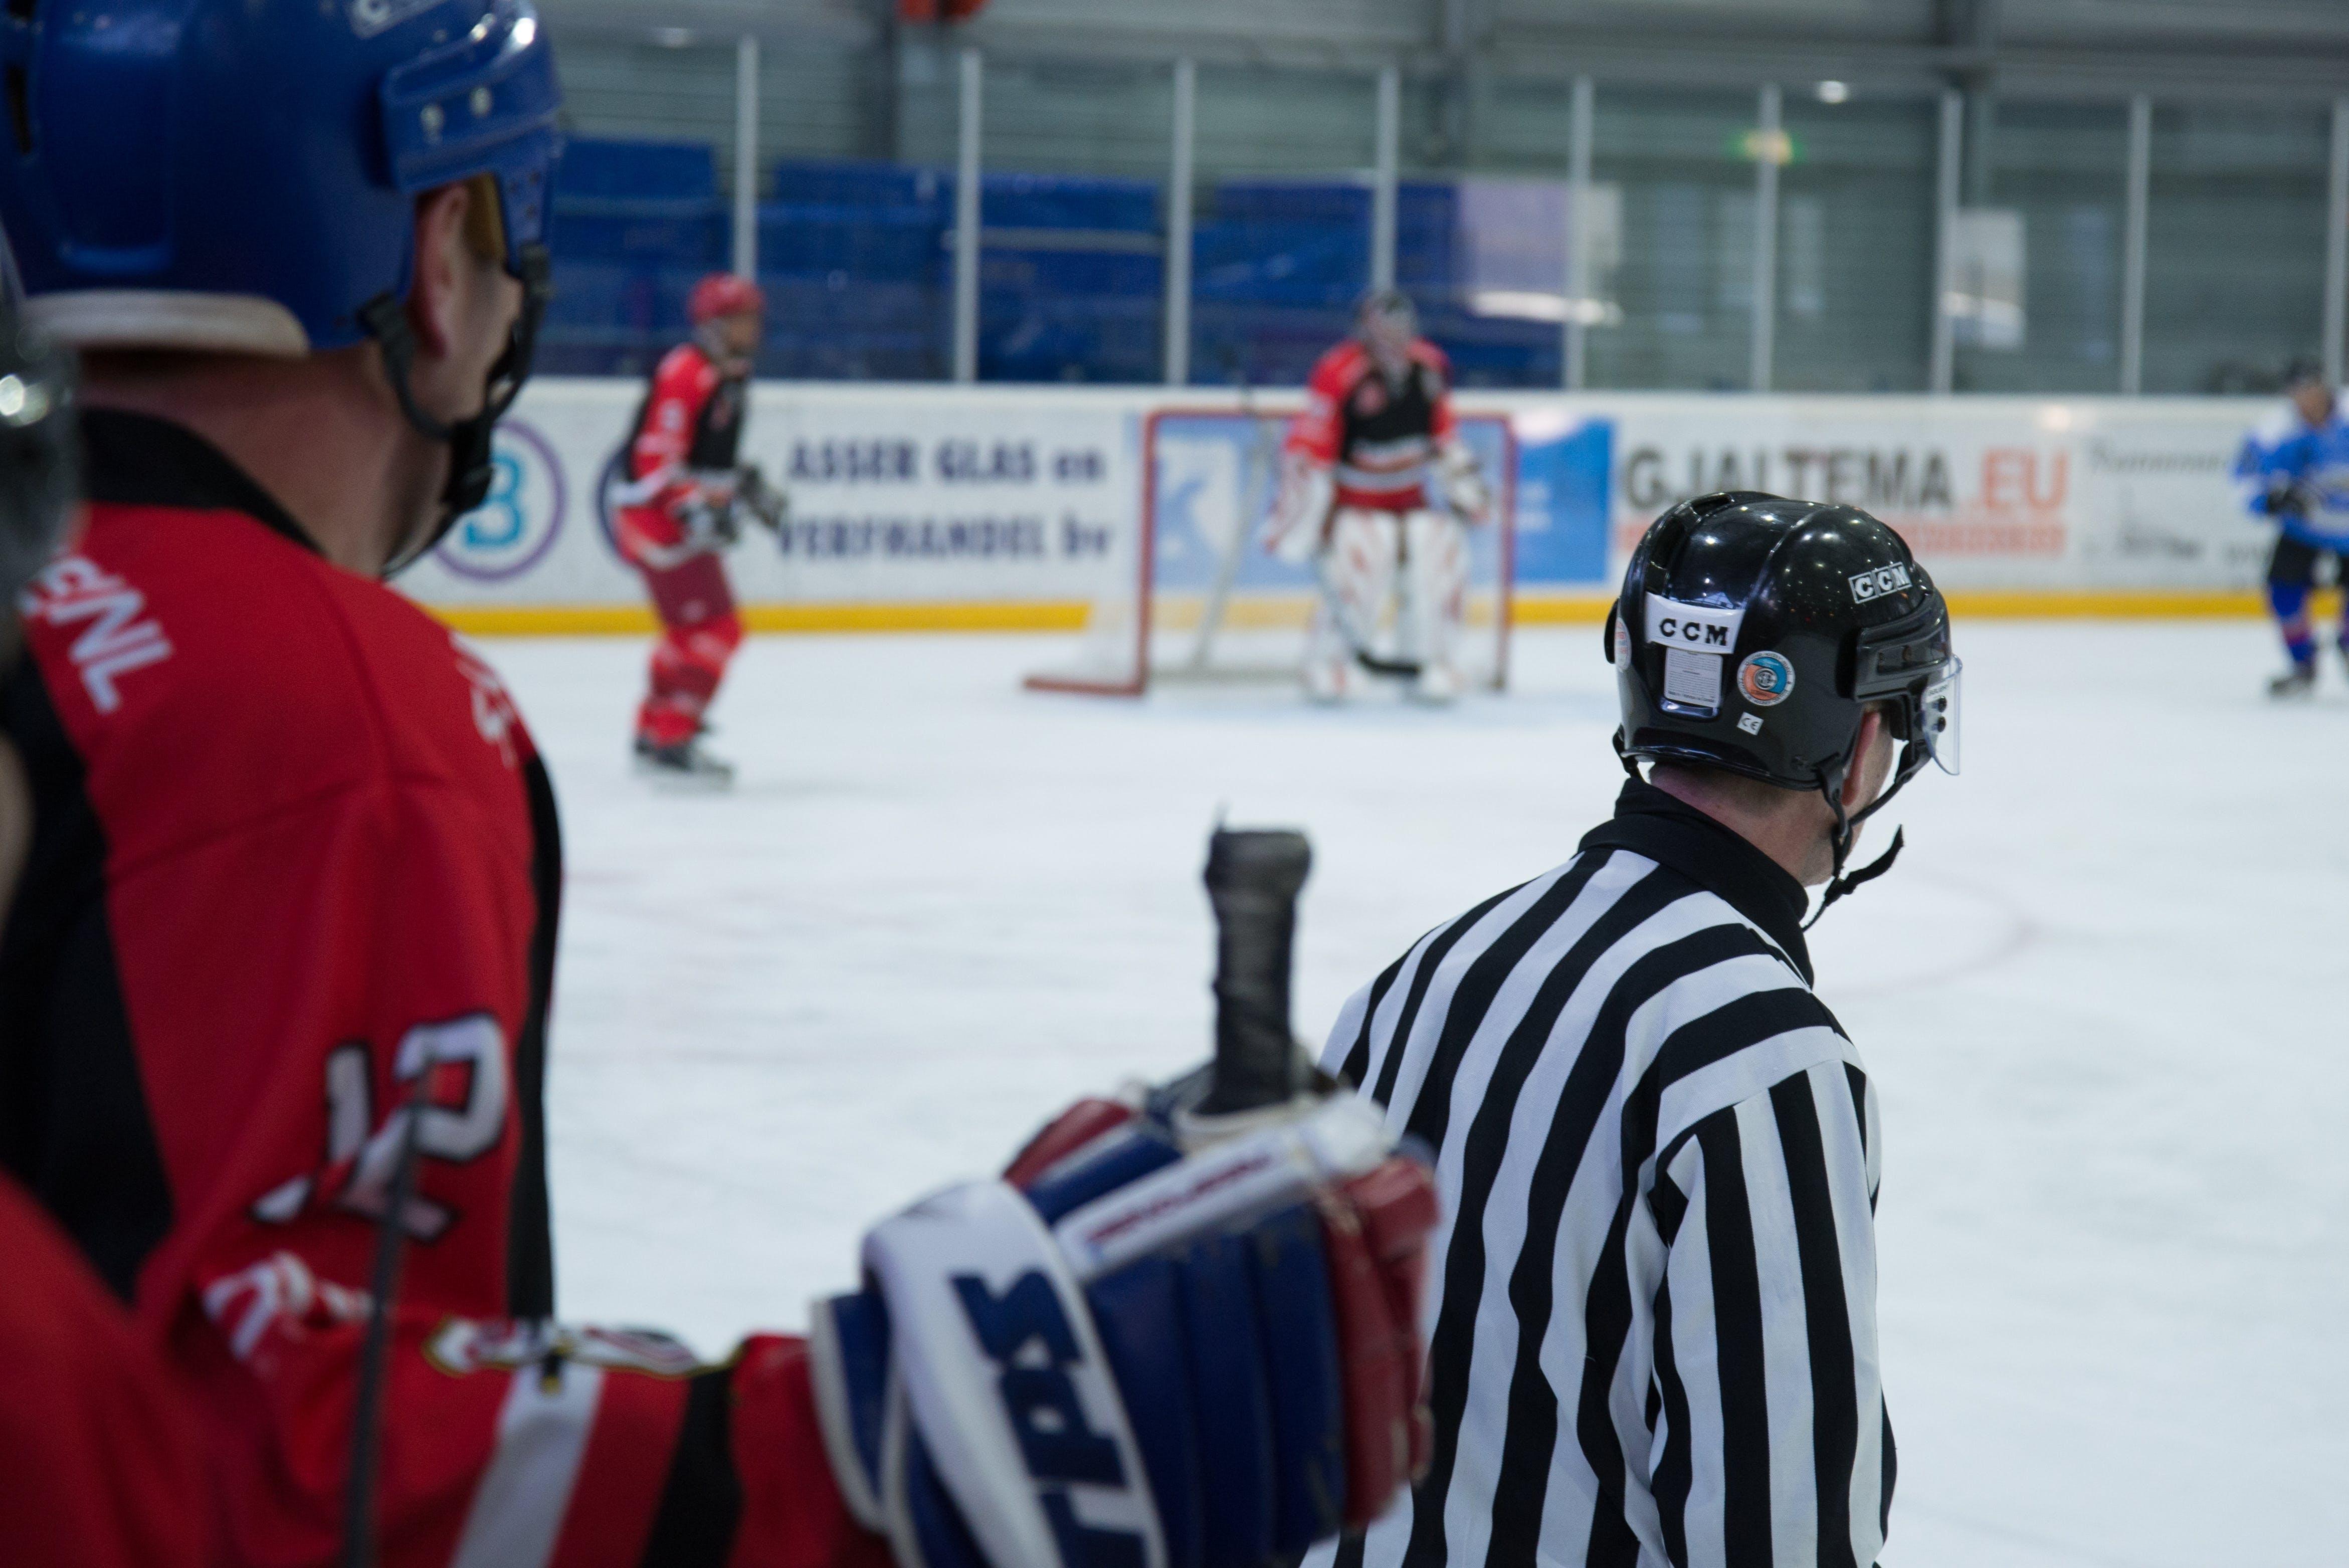 Hockey Players on Rink